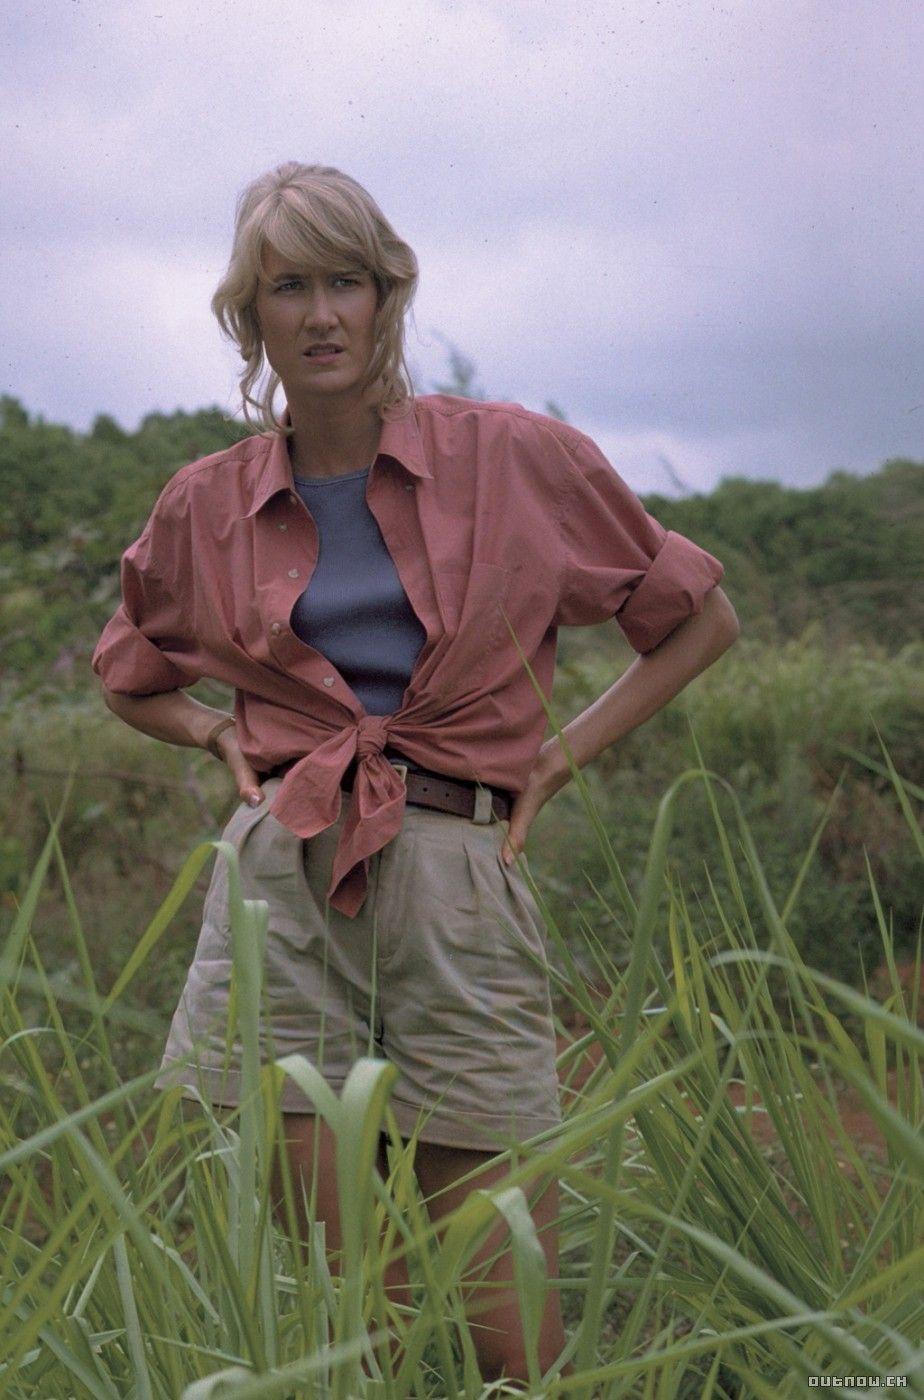 Female characters in action movies Dr. Ellie Sattler Laura Dern Jurassic Park Estante da Sala